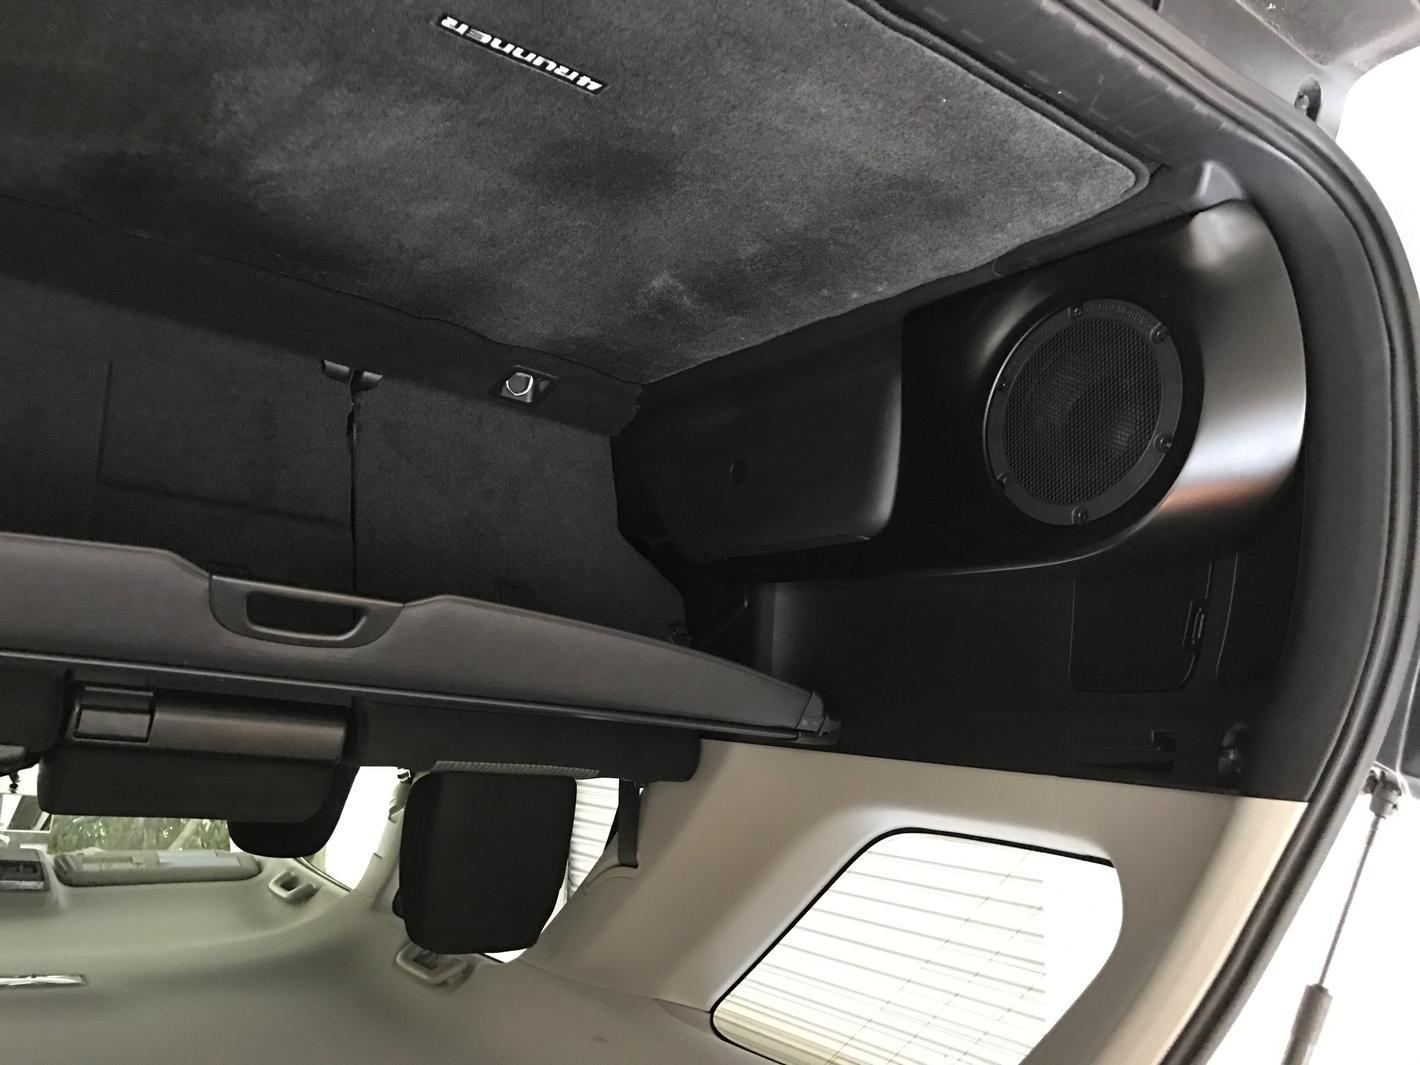 Oem Audio Plus >> Stereo Upgrade Oem Audio Plus Toyota 4runner Forum Largest